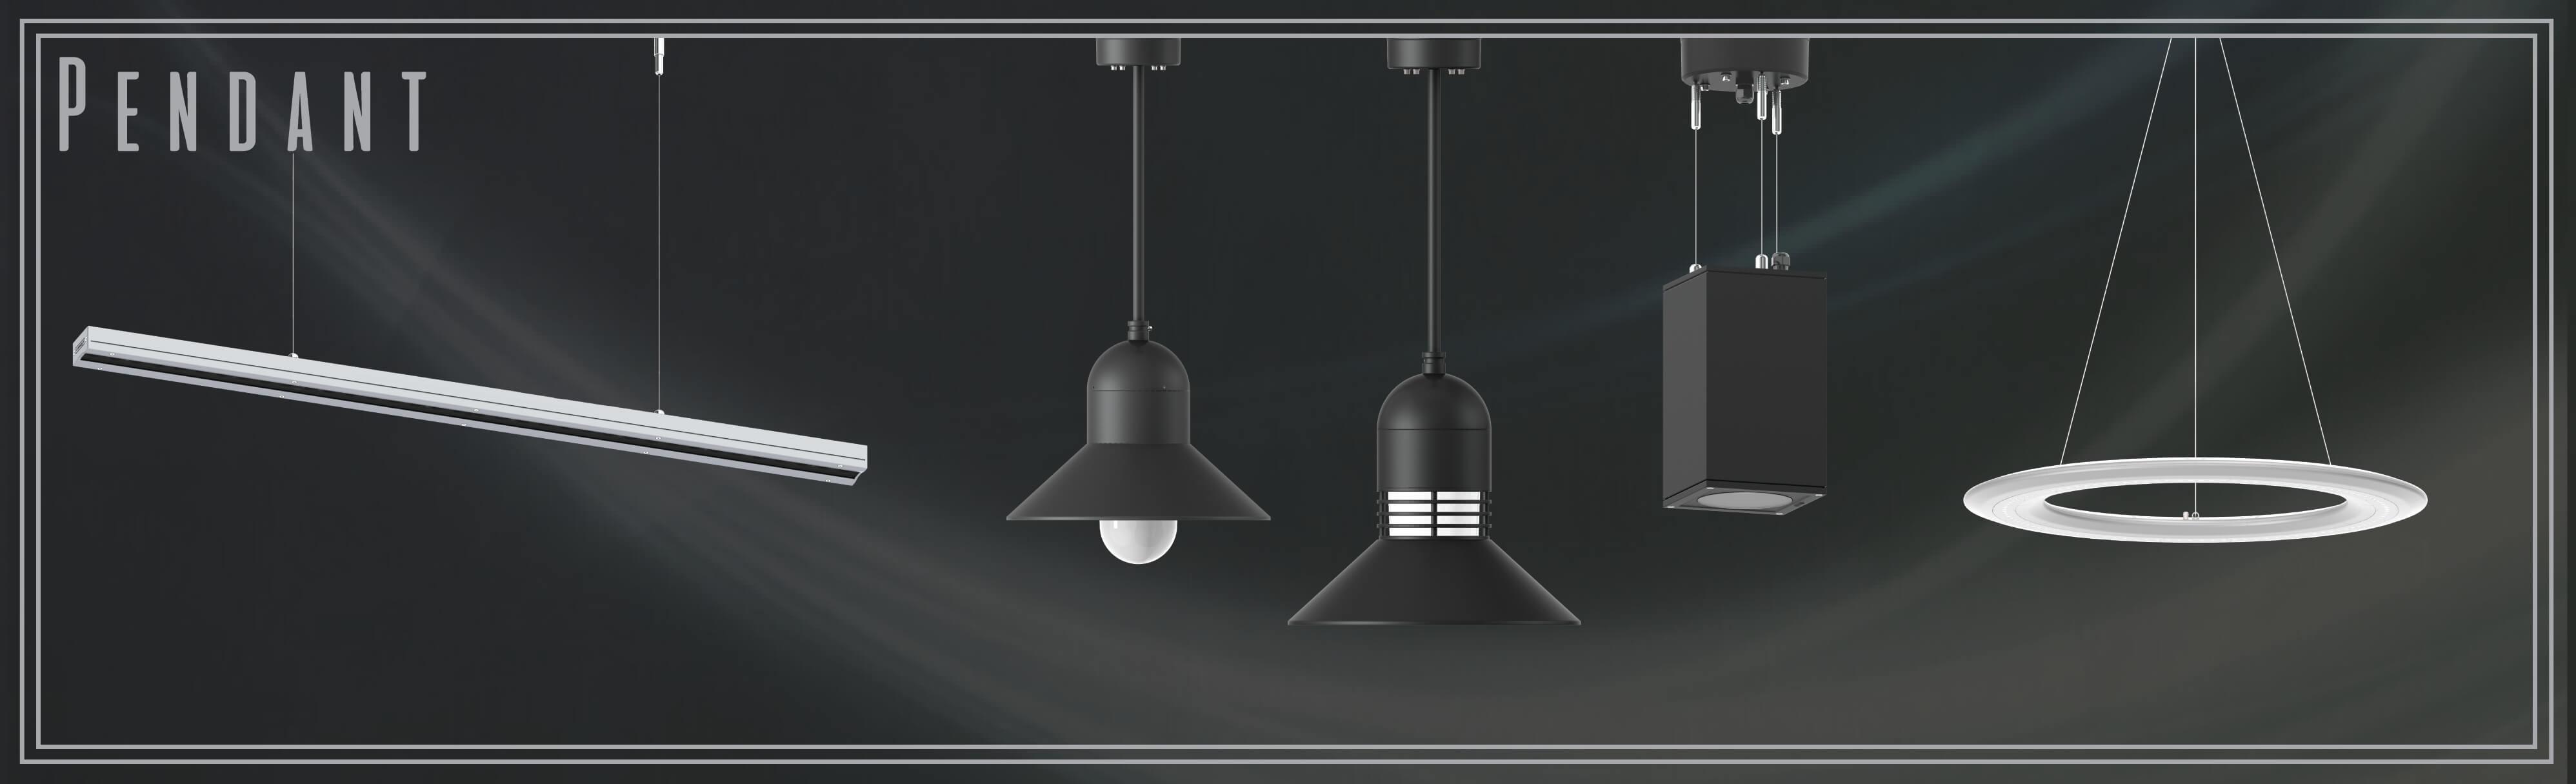 Lovely 120v Landscape Lighting Fixtures